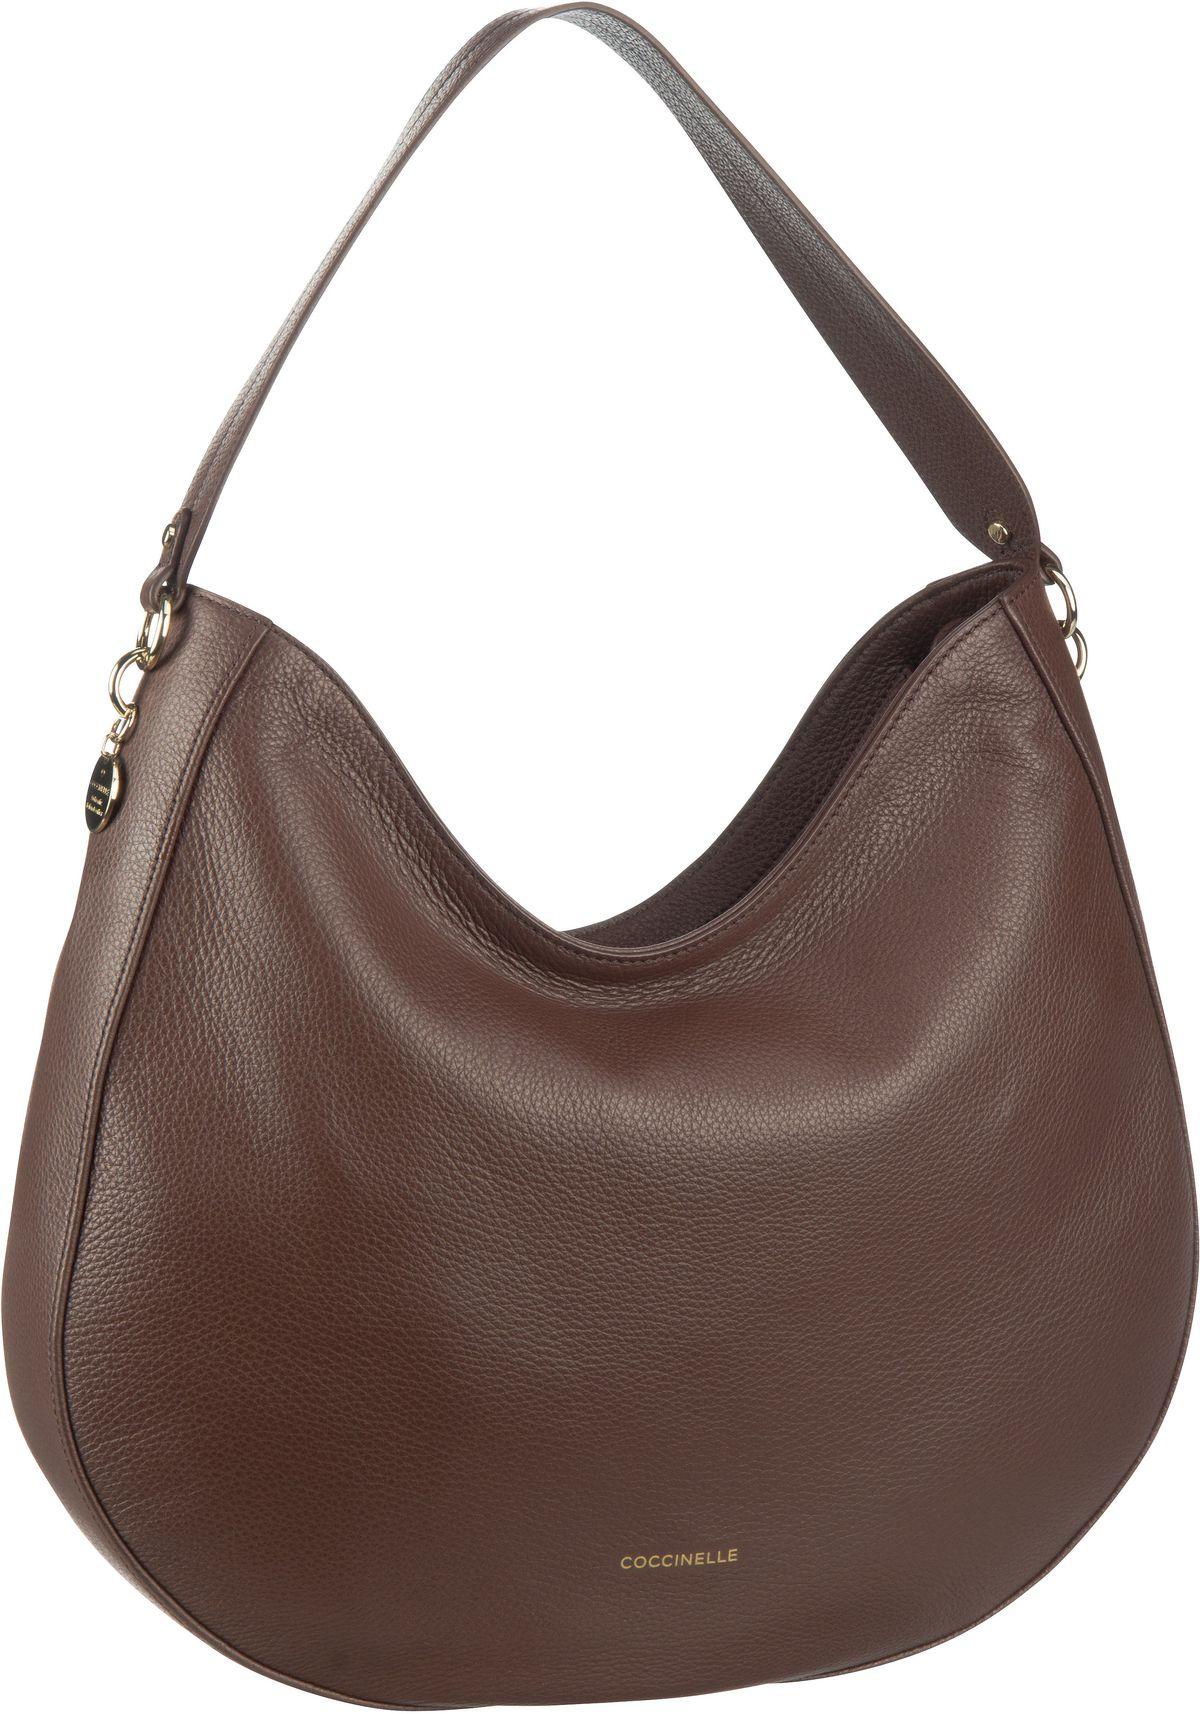 Handtasche Alpha 1301 Chocolate